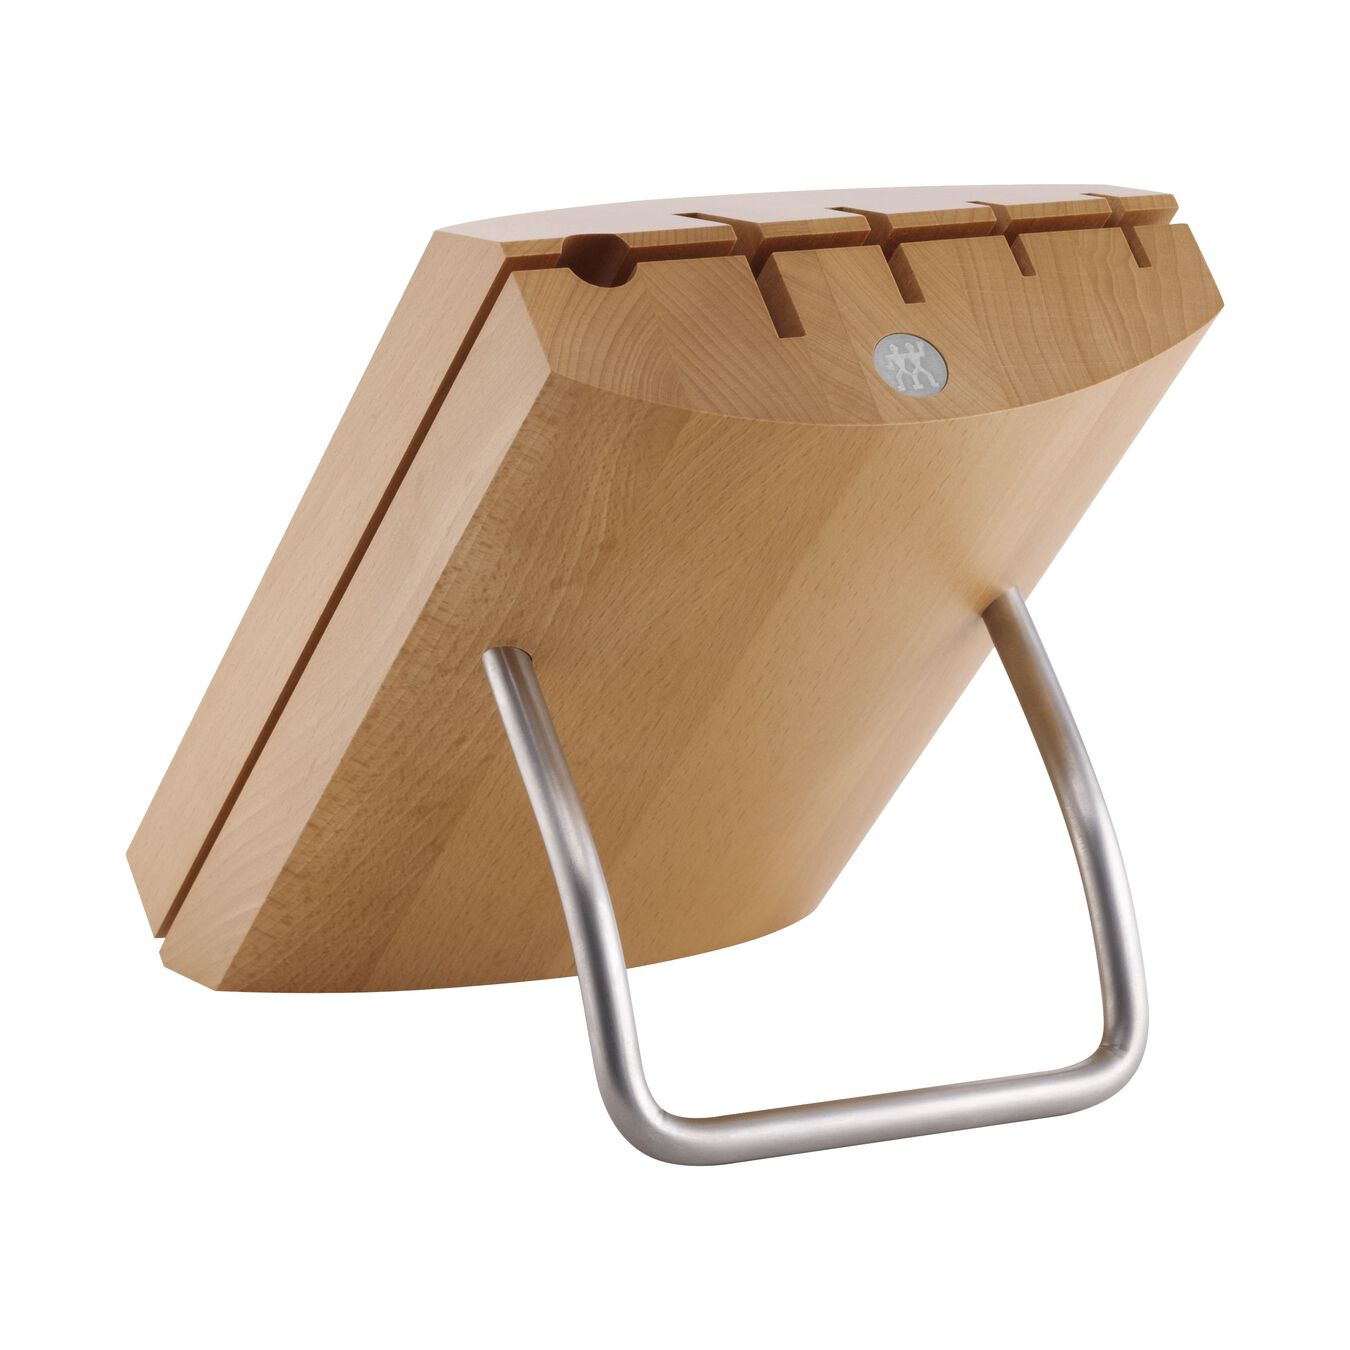 Blok Bıçak Seti | Özel Formül Çelik | 6-adet,,large 6